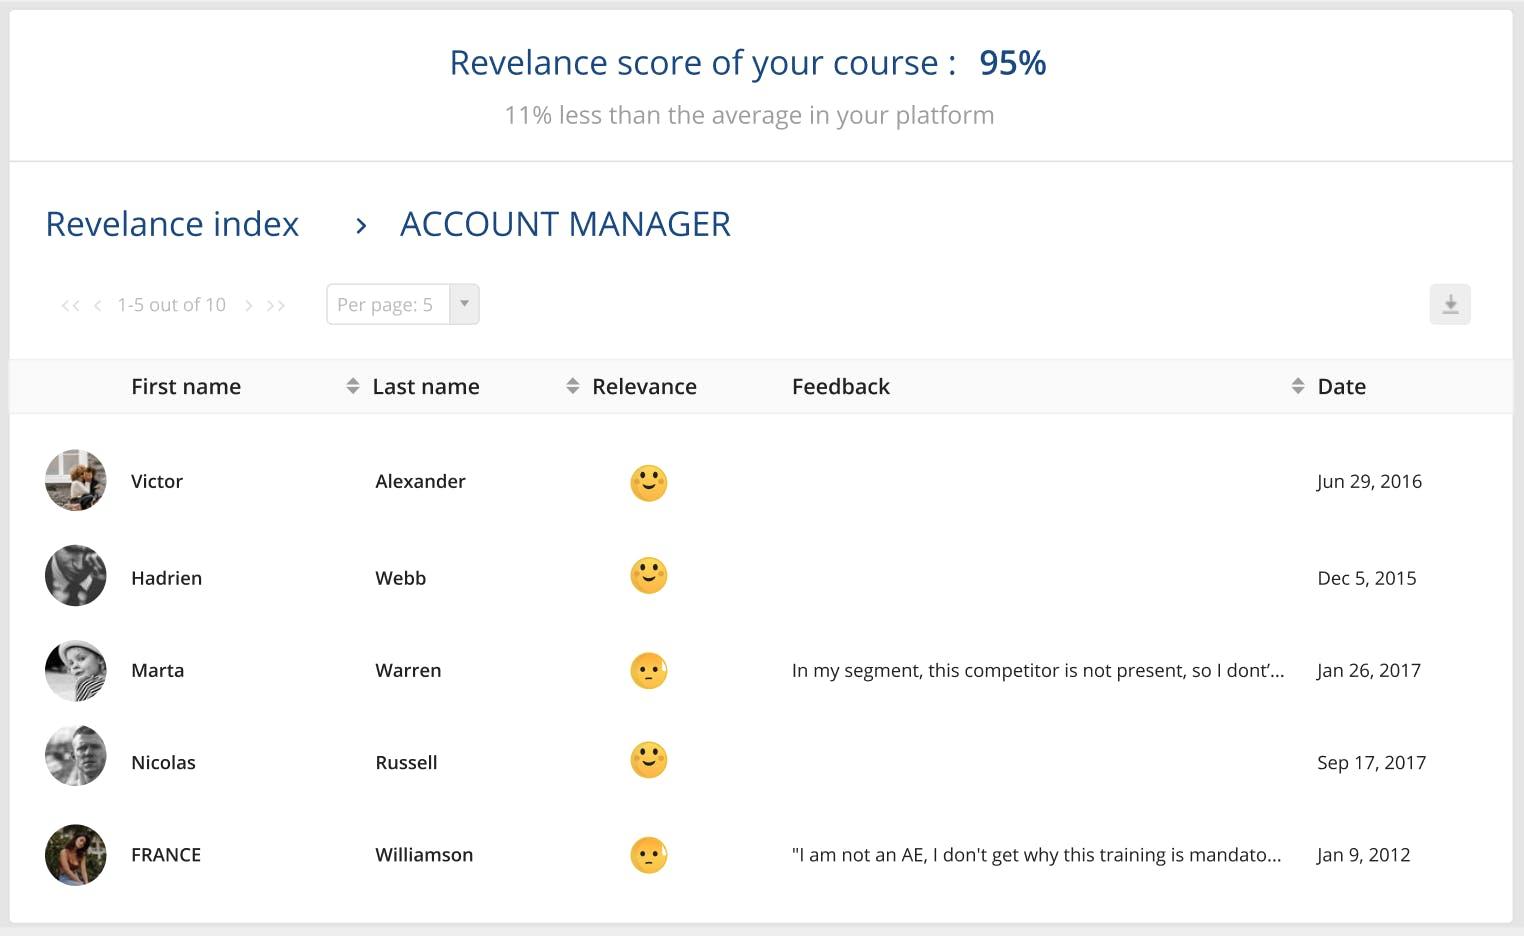 Relevance scores feedback